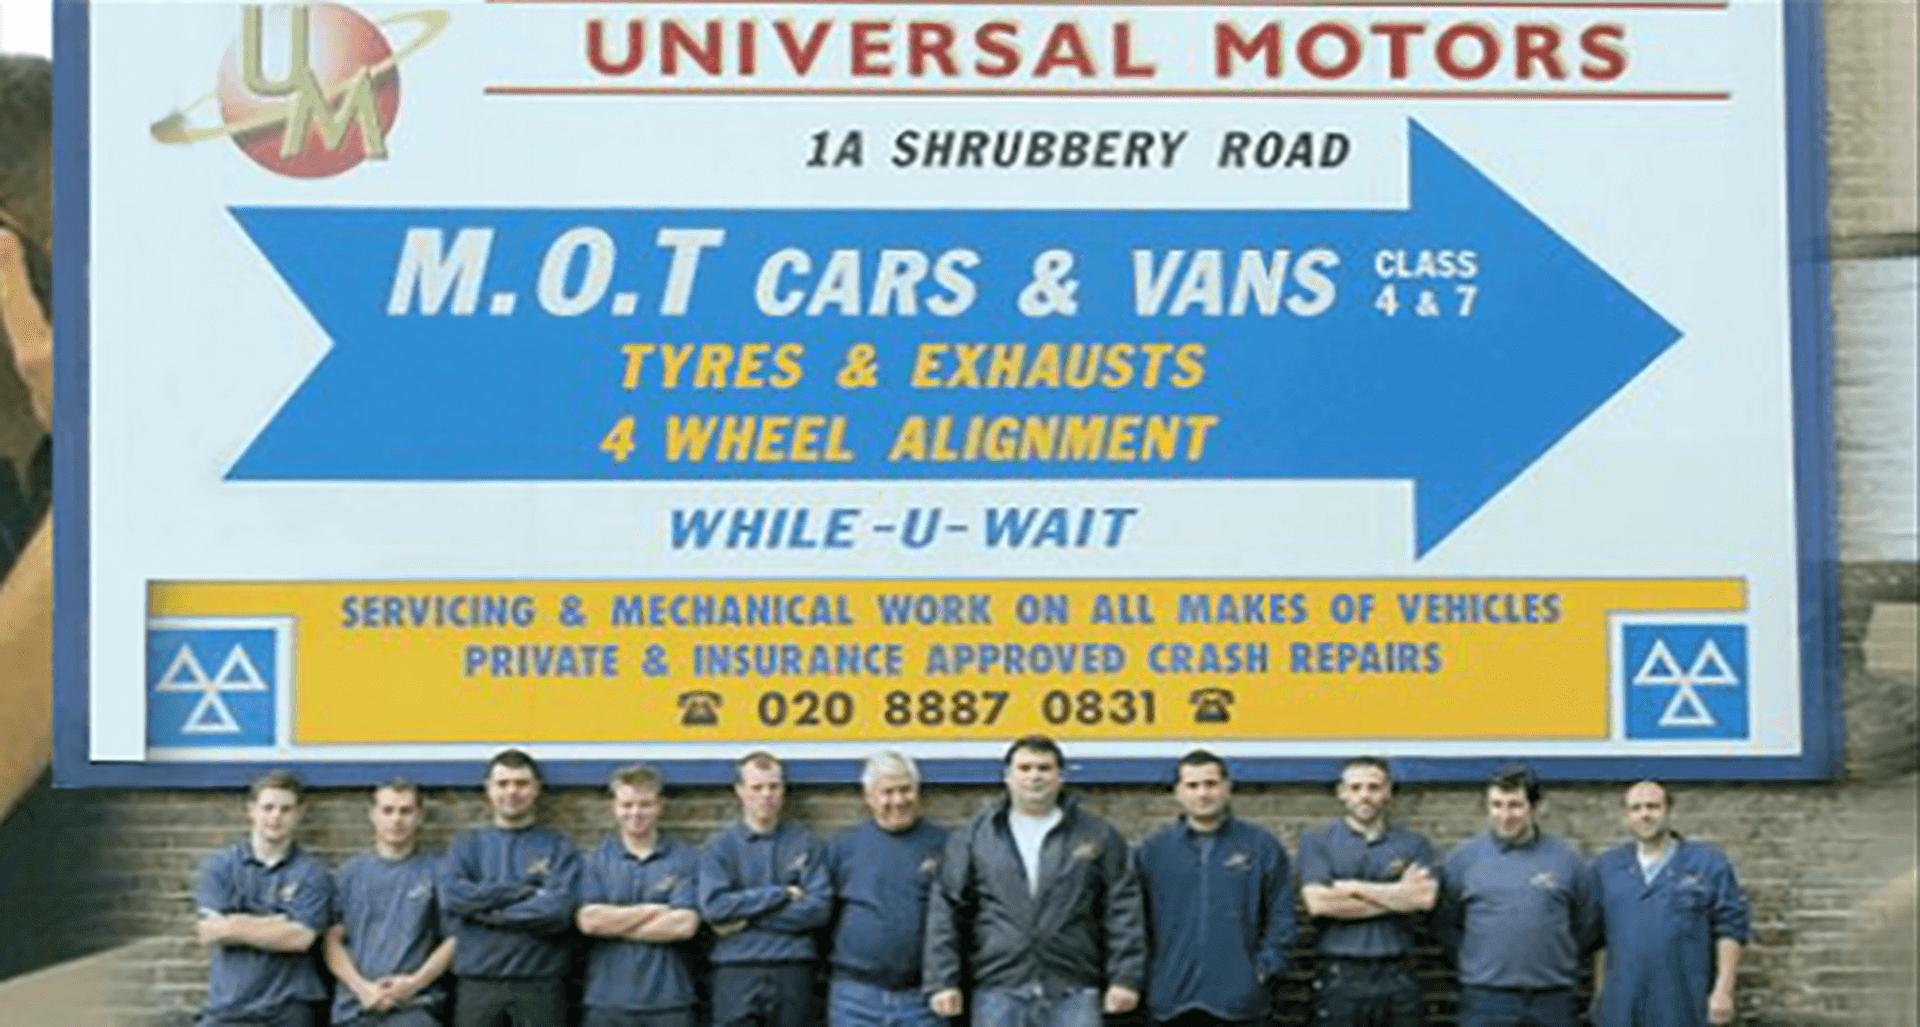 All mechanics under billboard